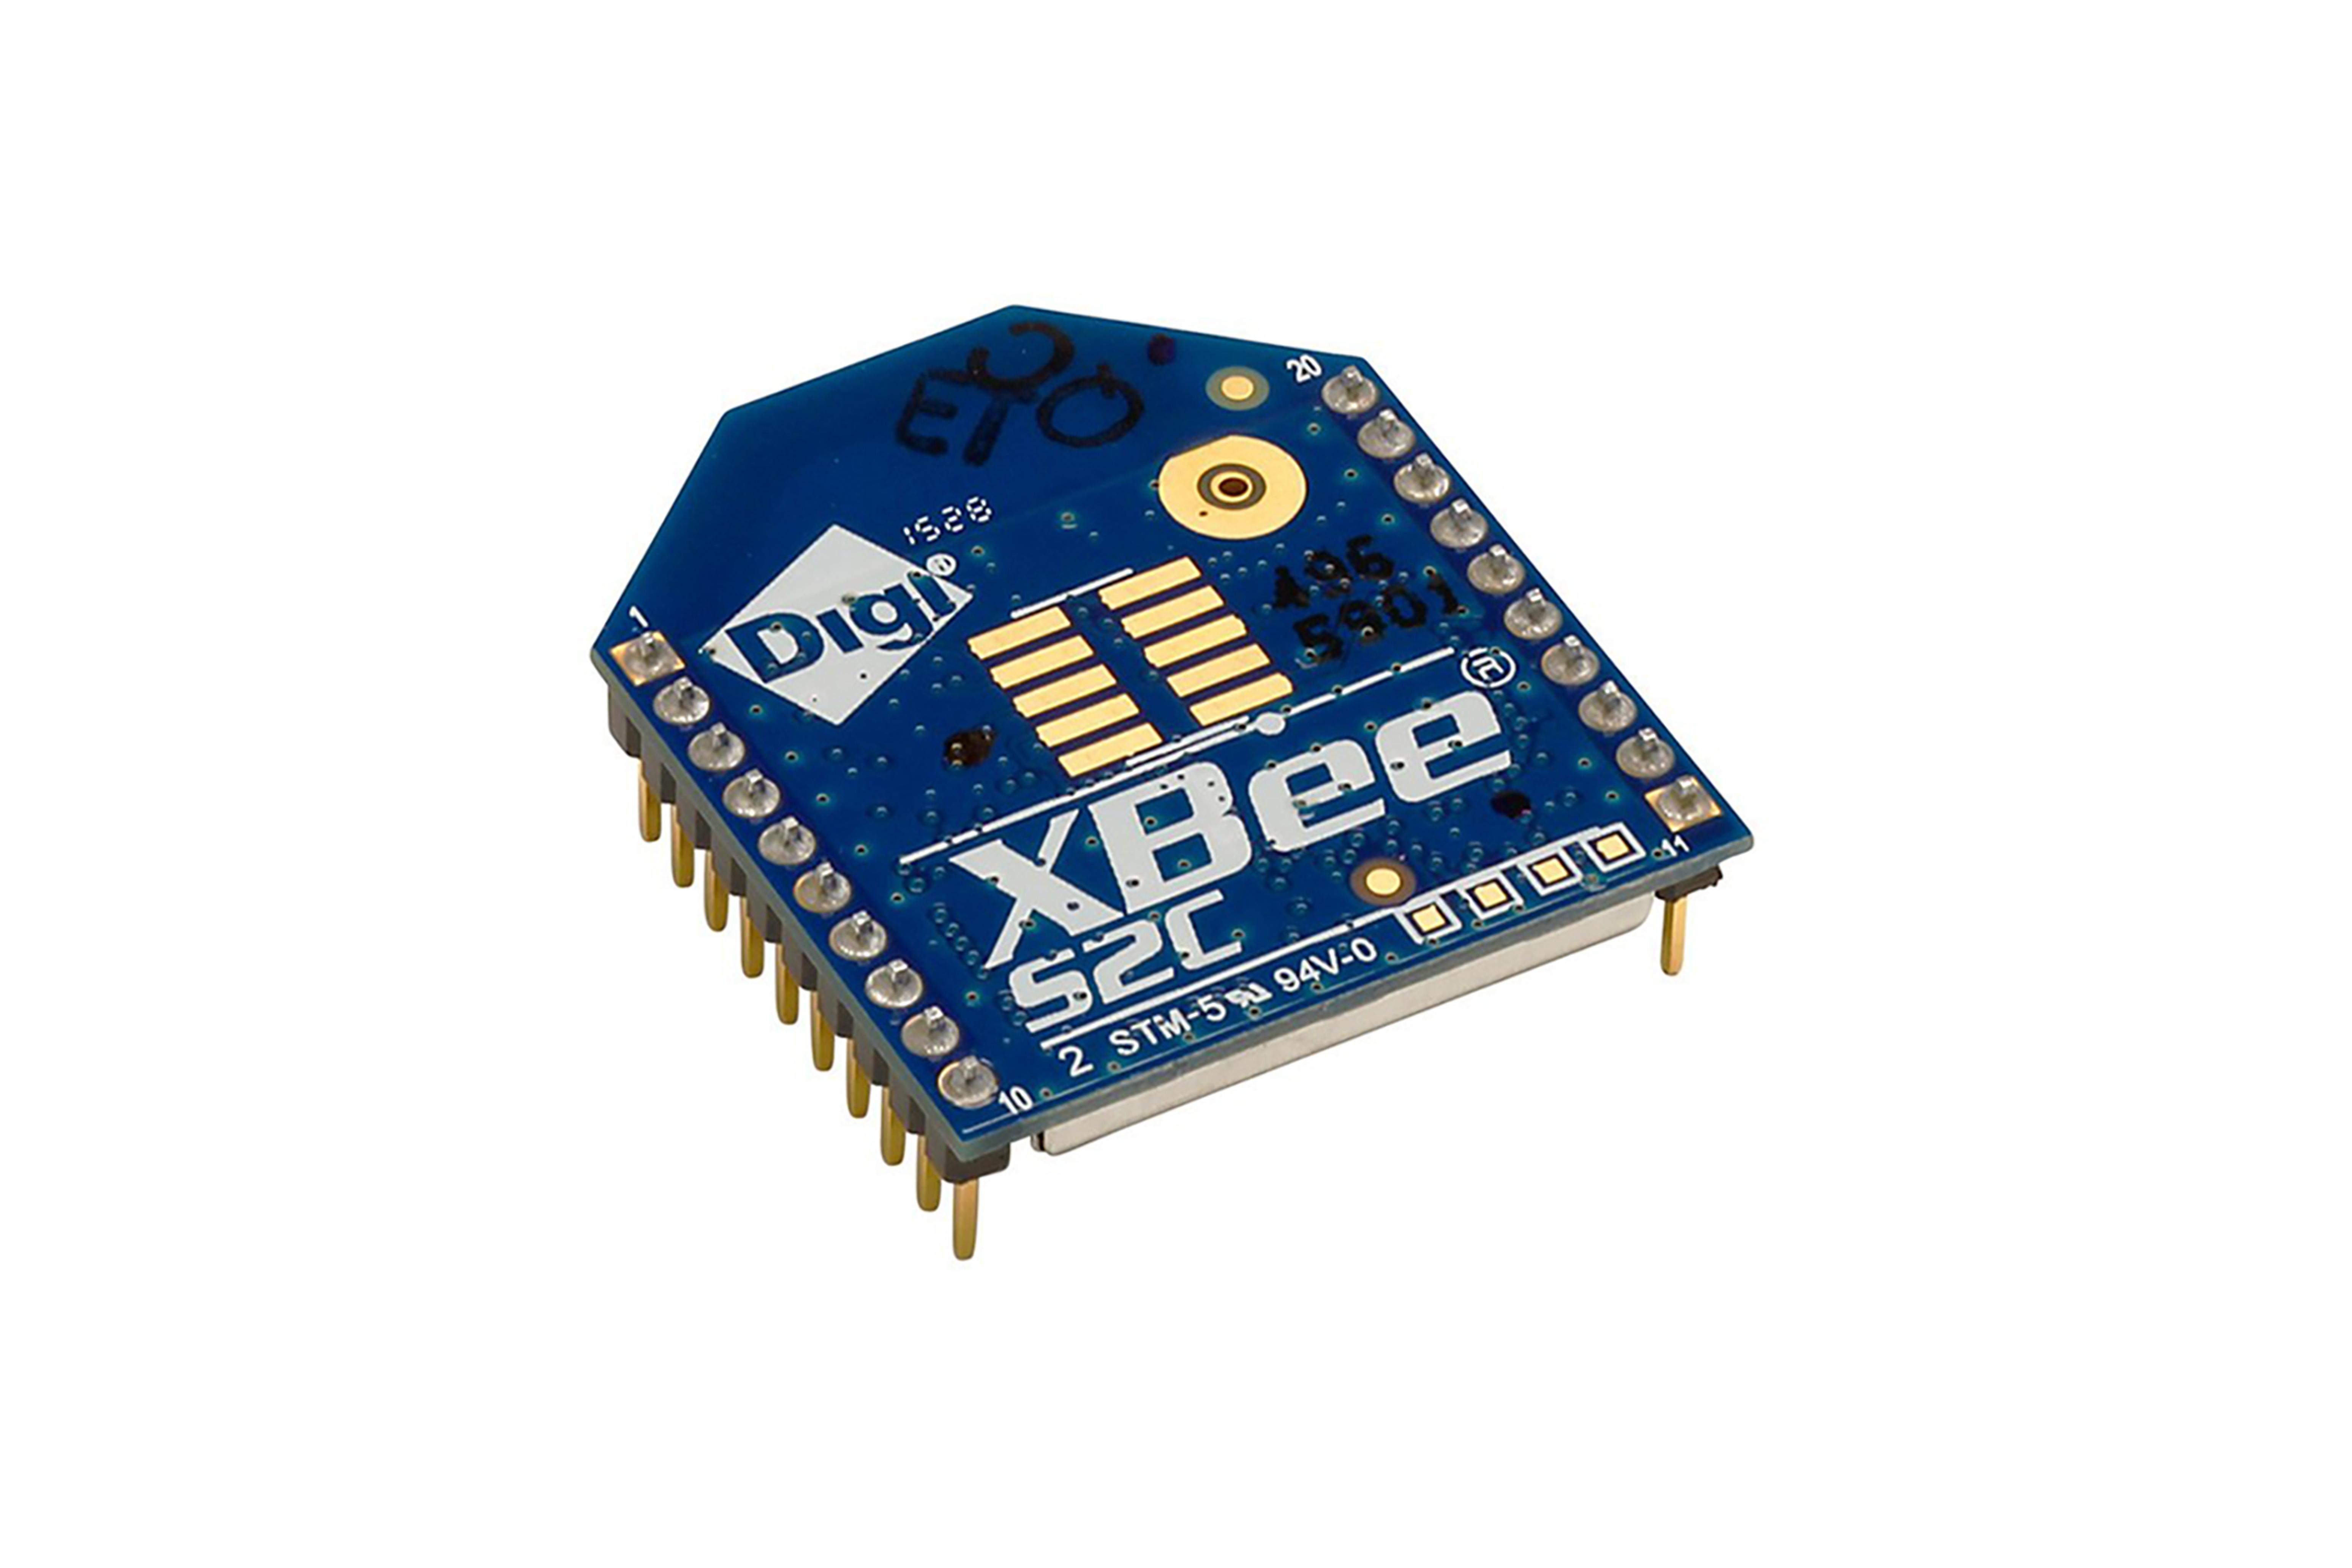 Modulo RFXBee ZigBee,AntennaPCB(TH)